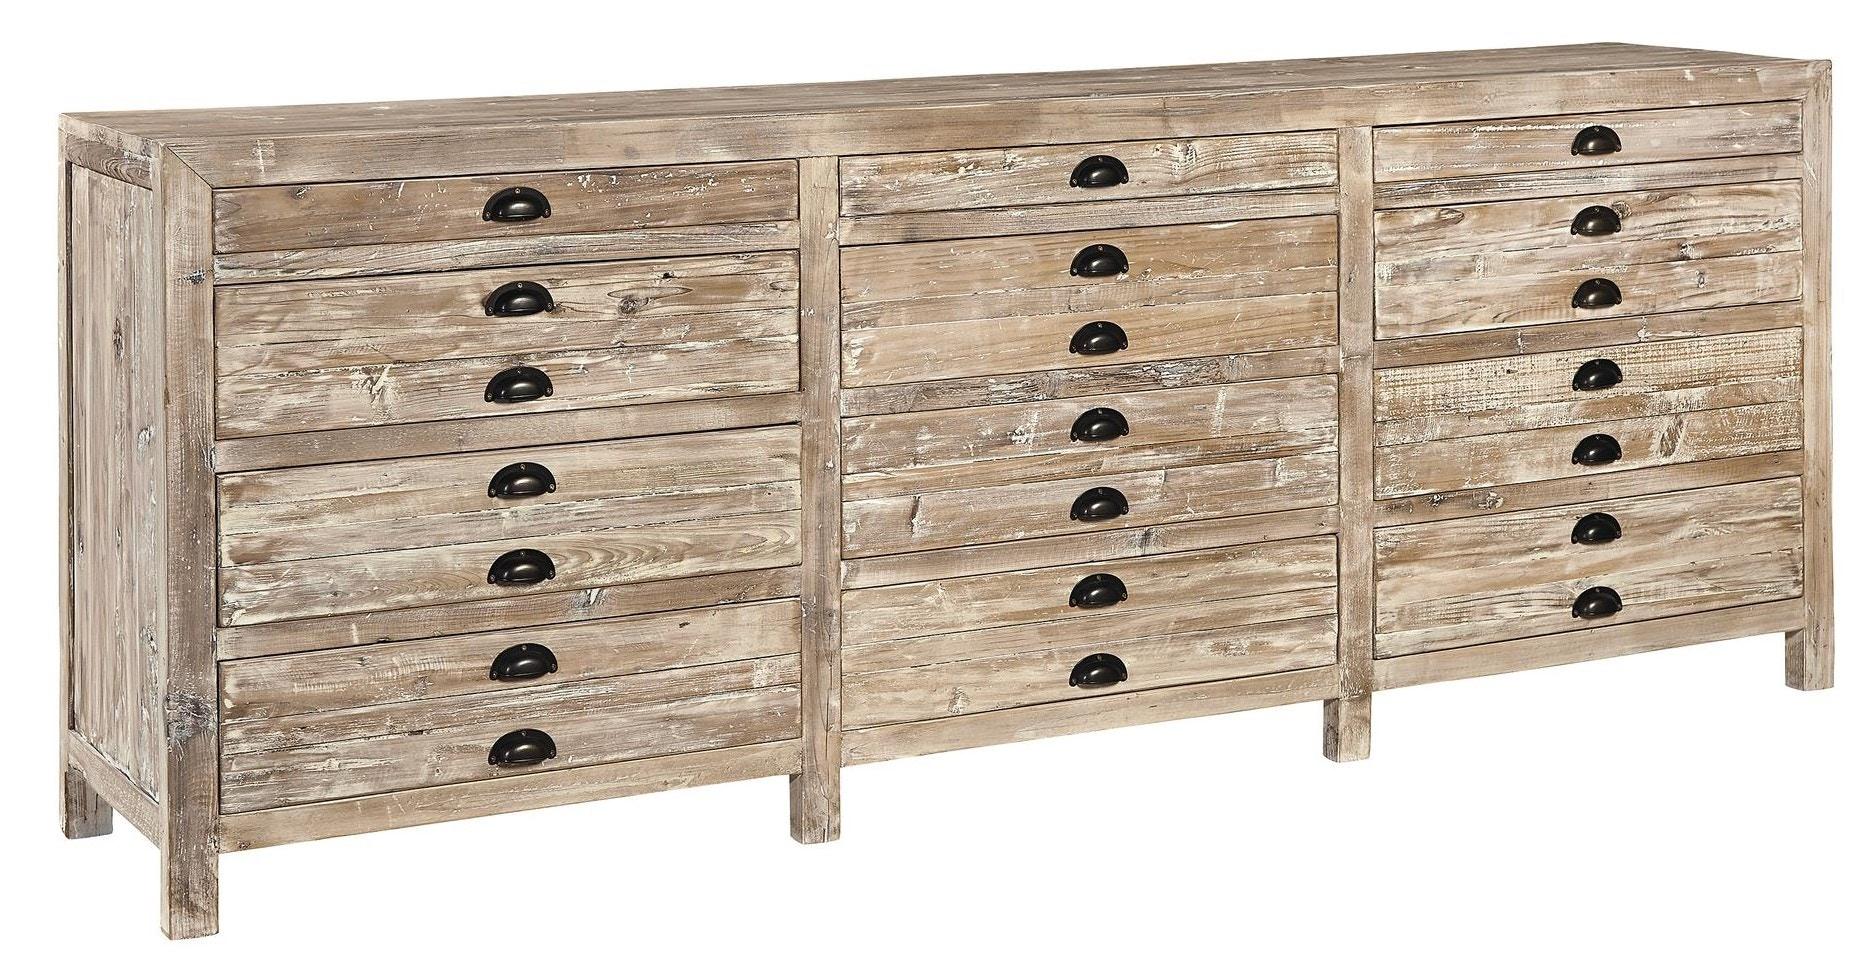 Bon Furniture Classics Apothecary Chest 84223